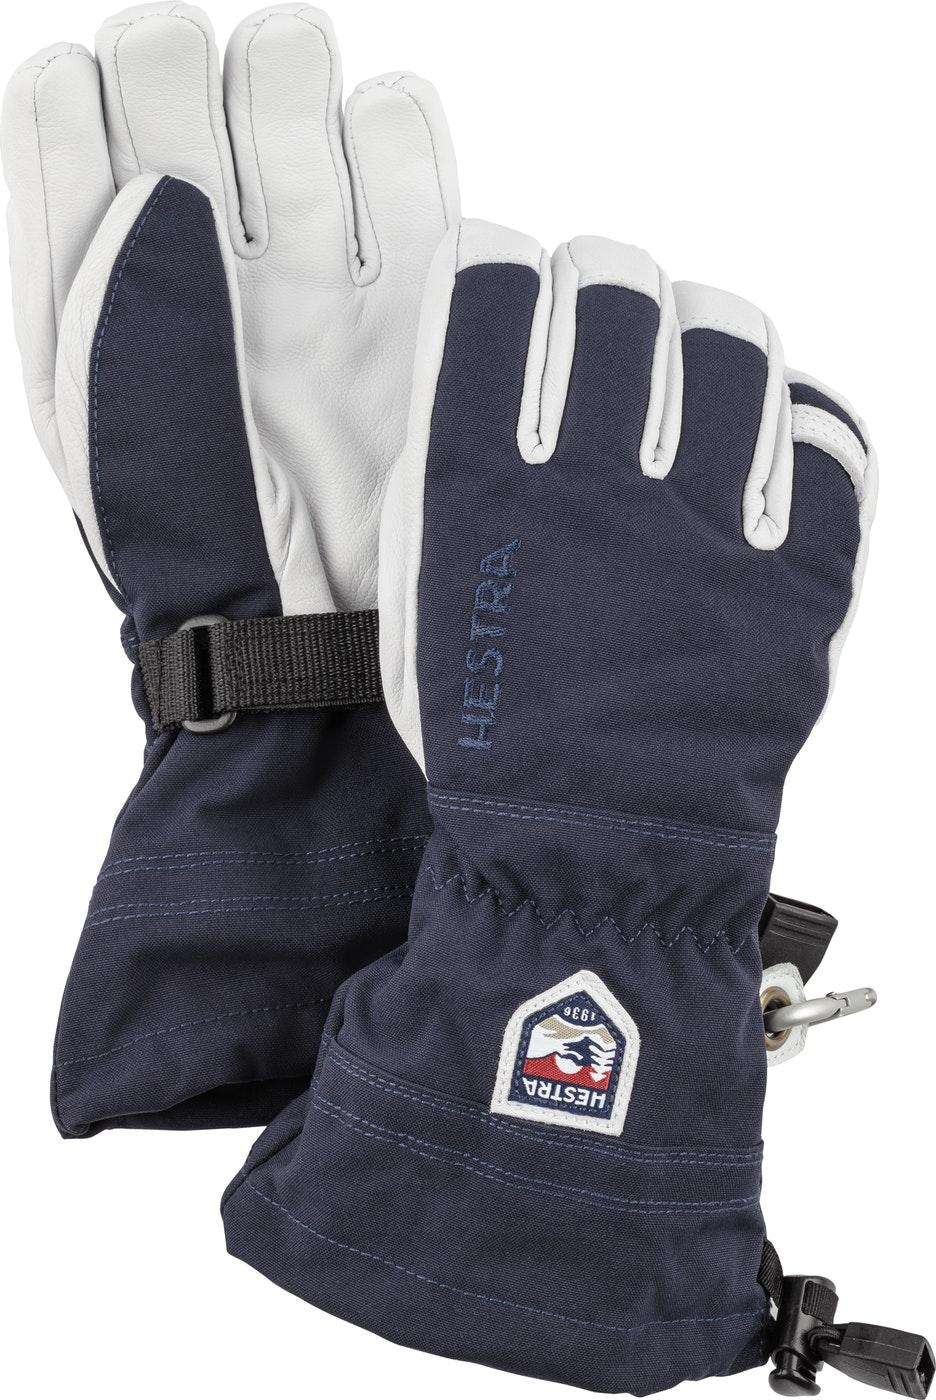 Hestra Army Leather Heli Ski JR 5 finger